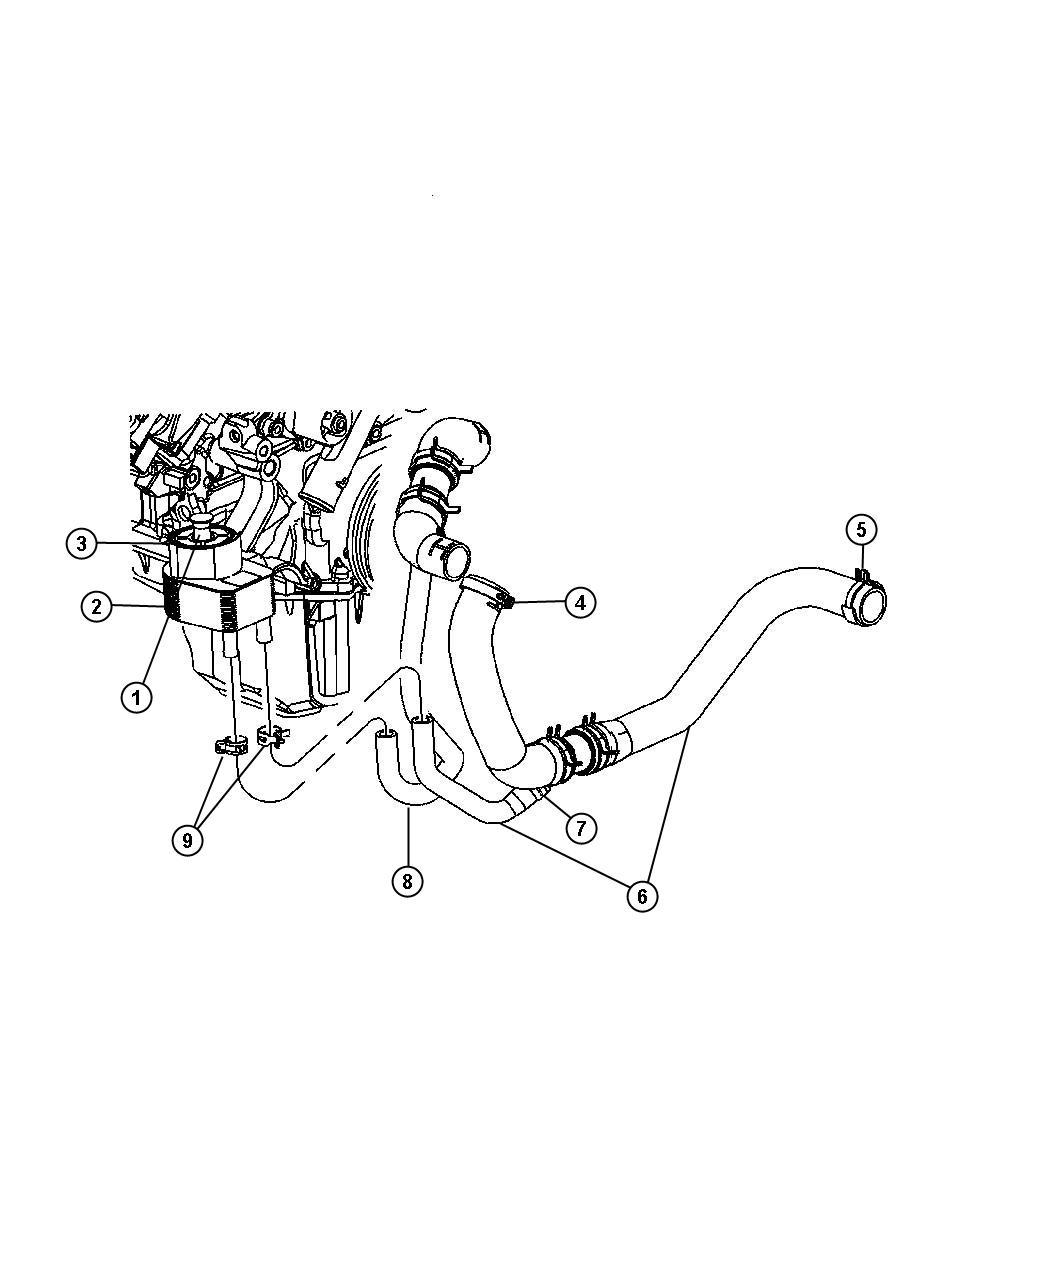 Chevrolet Impala Fuel Filter